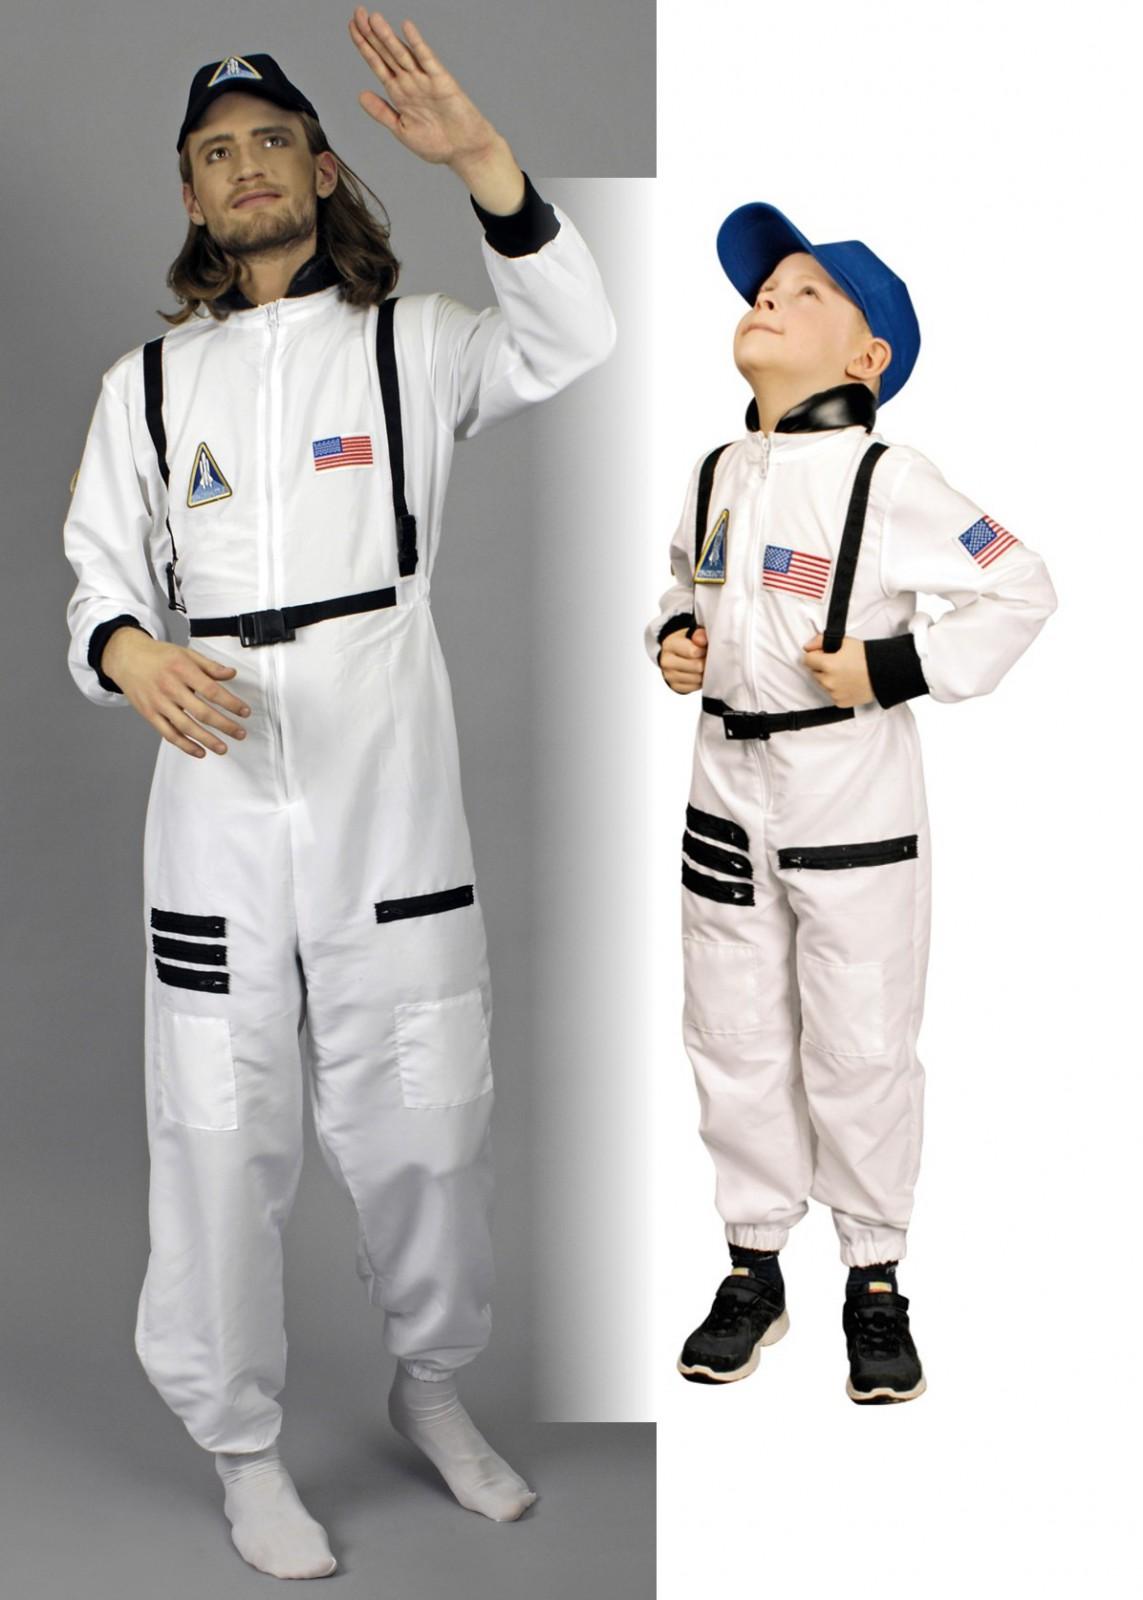 kost m astronaut mit kappe herren kinder astronautenanzug. Black Bedroom Furniture Sets. Home Design Ideas